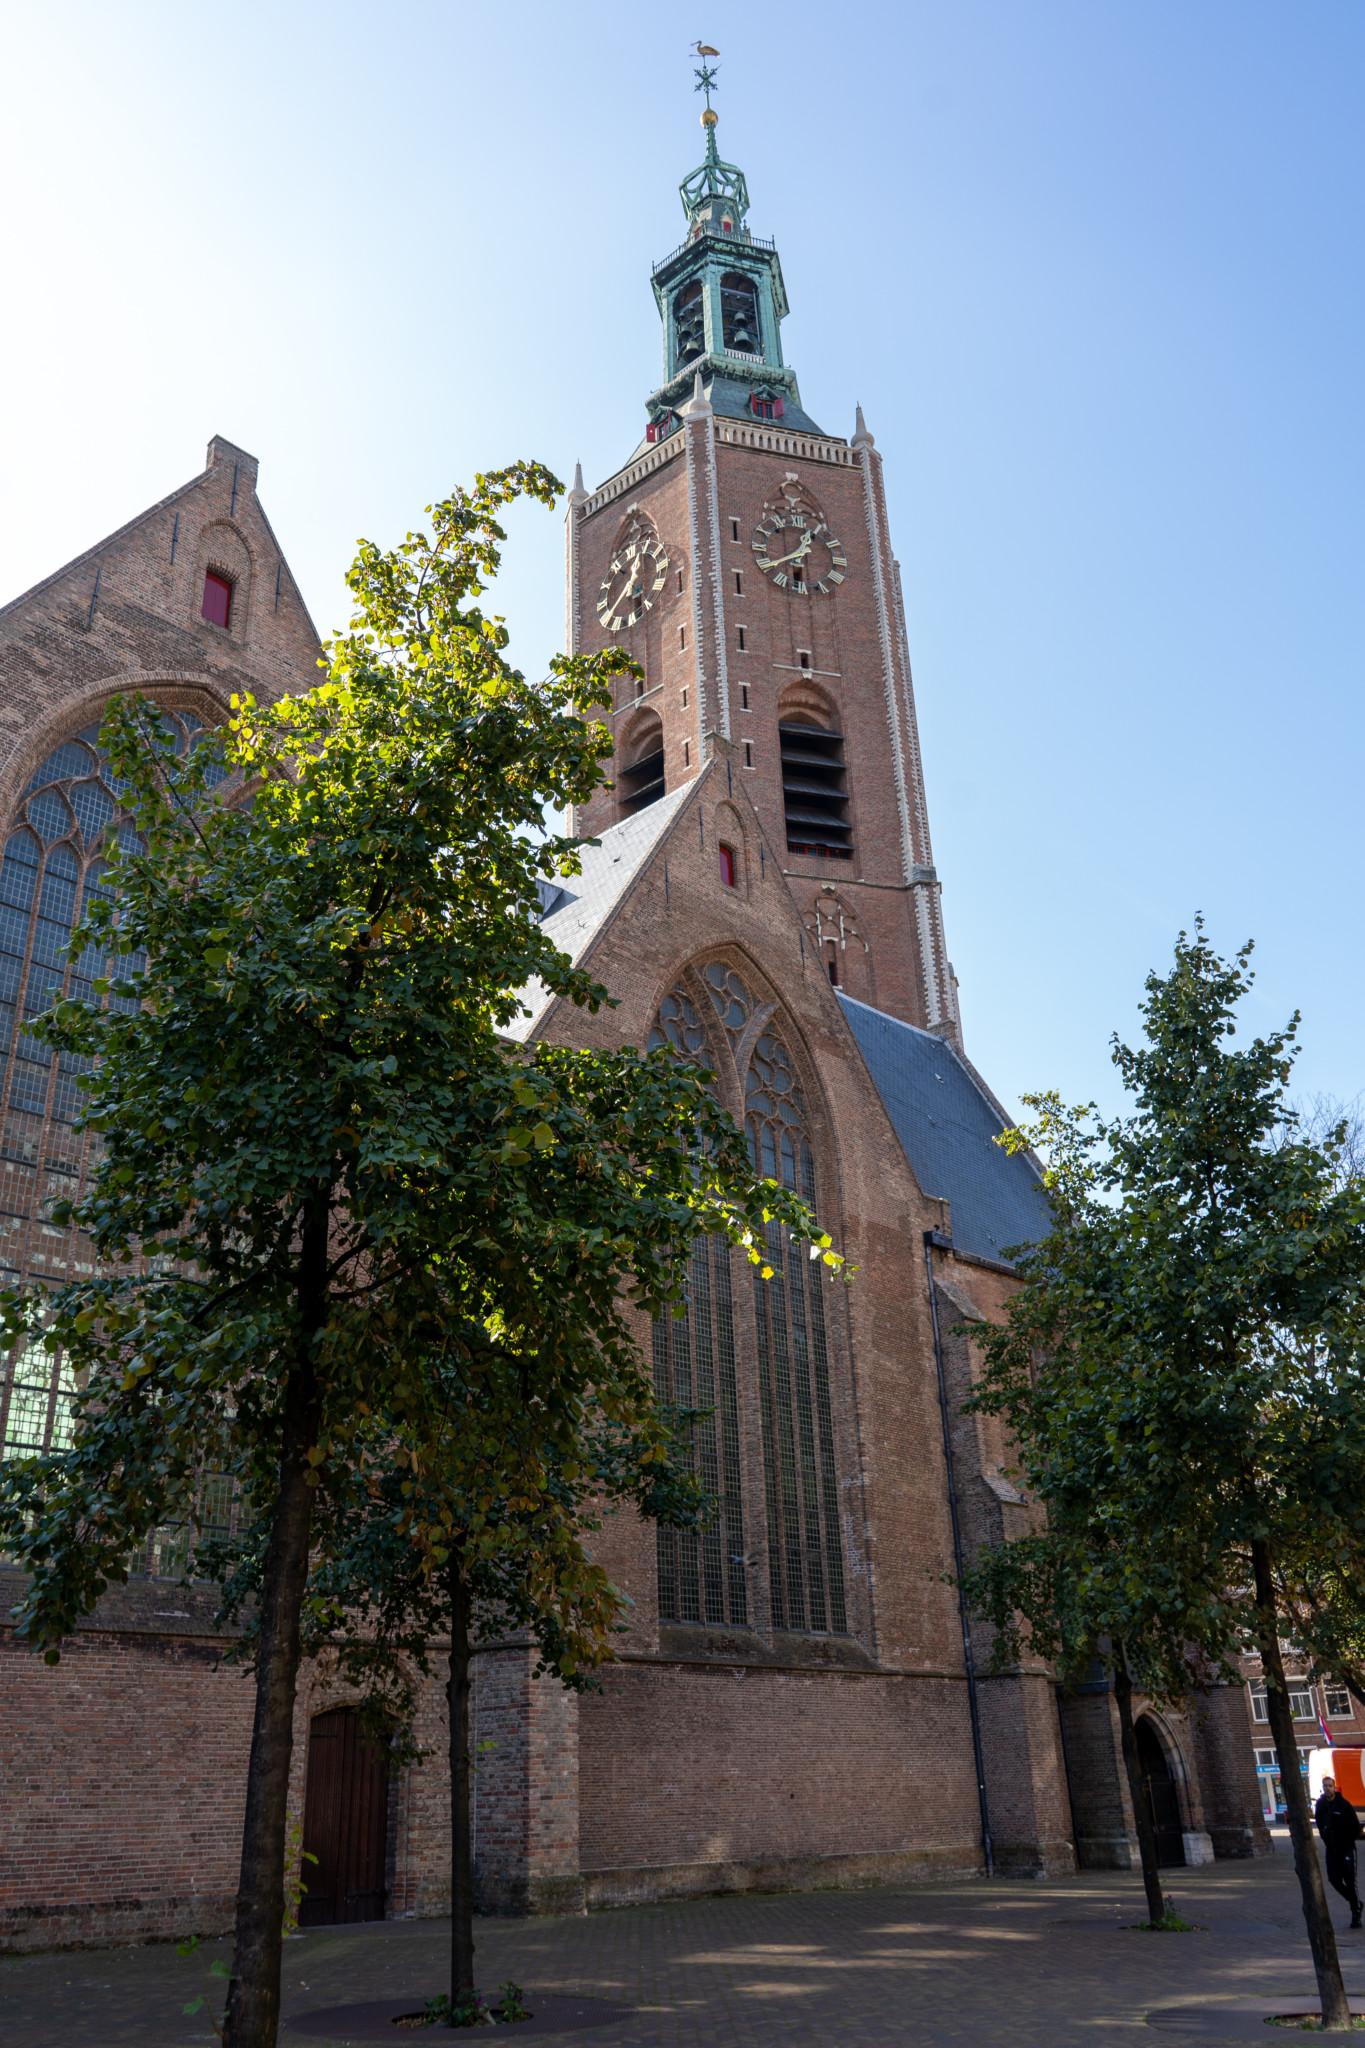 Andere Seite der Groten Kerk in Den Haag